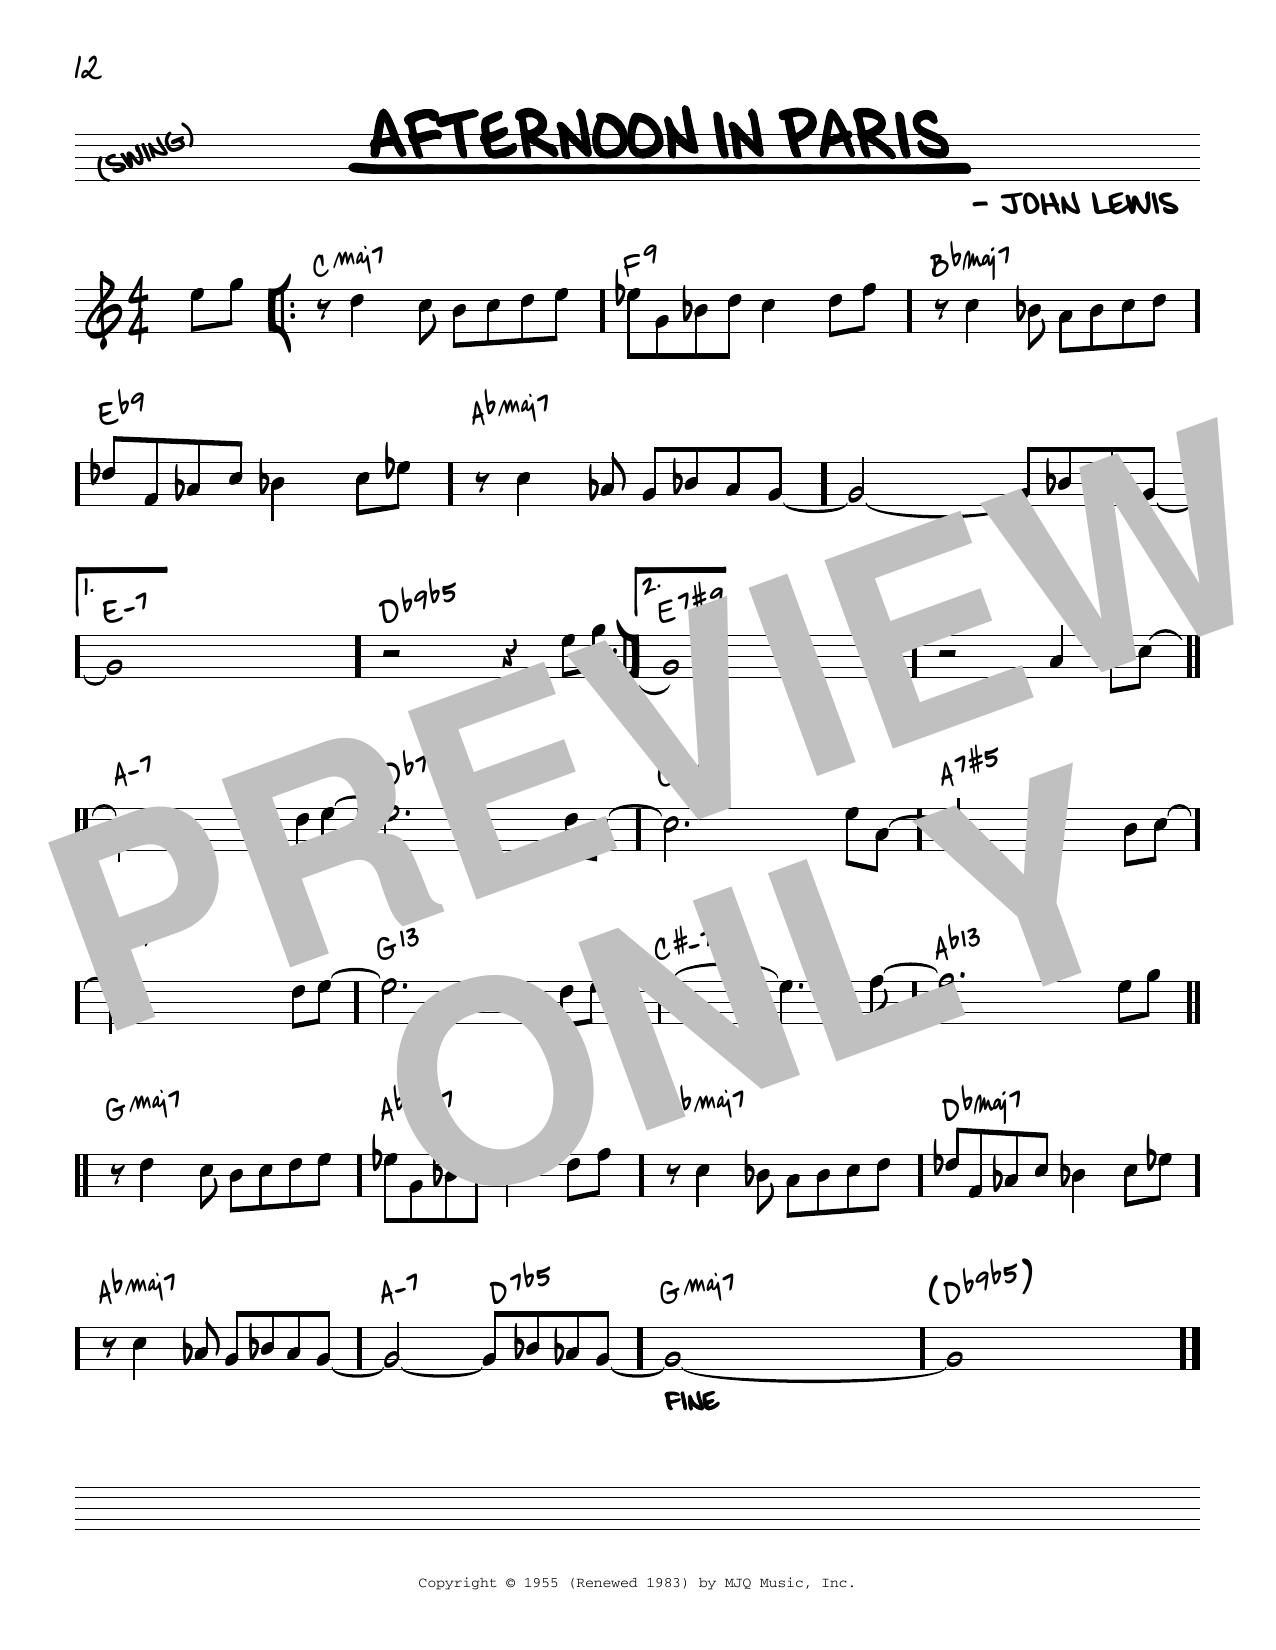 John Lewis Afternoon In Paris [Reharmonized version] (arr. Jack Grassel) sheet music notes printable PDF score